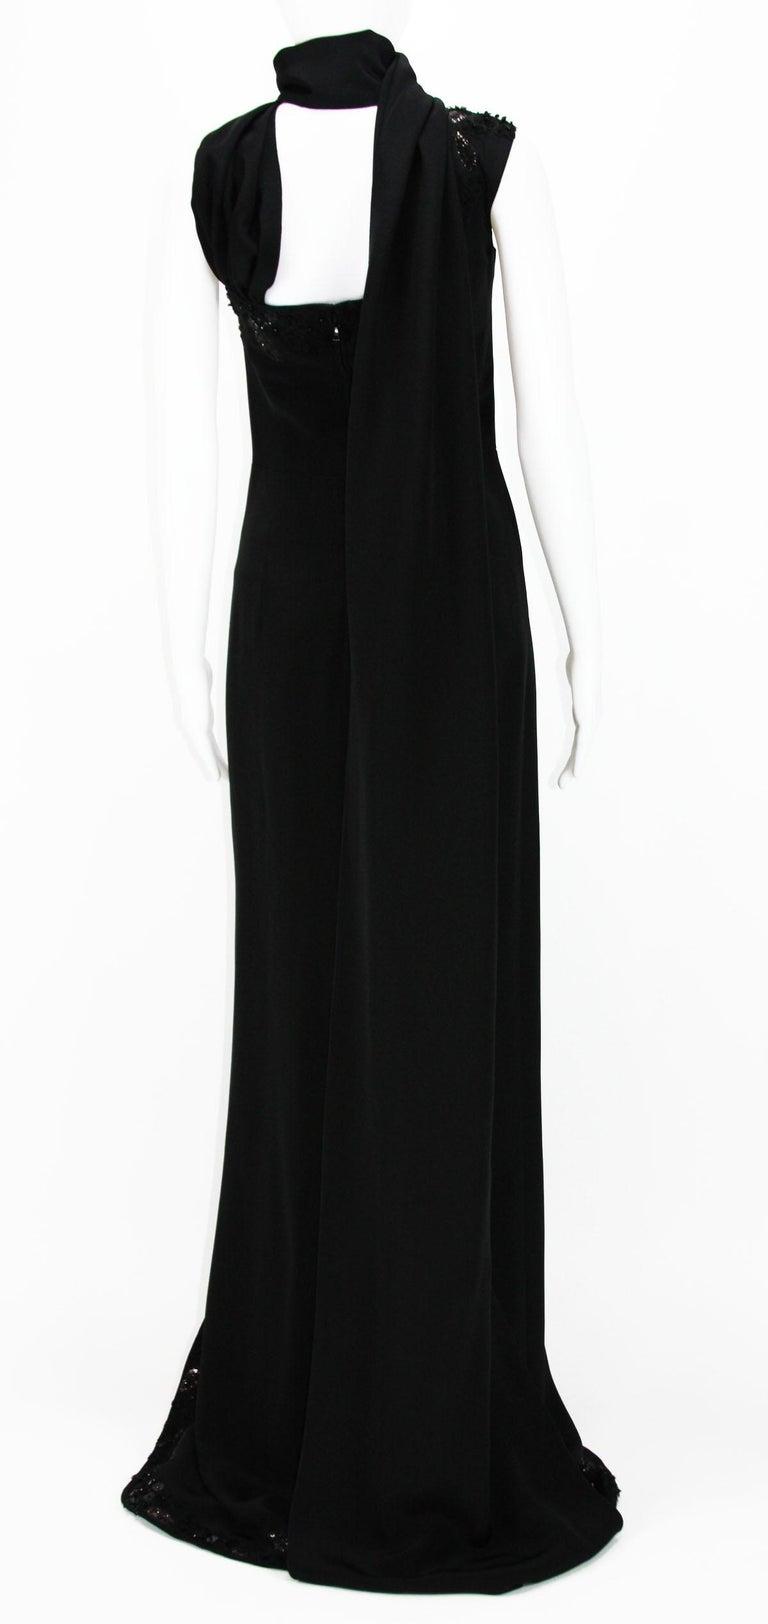 New $7500 L'WREN SCOTT S/S 2010 Represent Her *MADAME DU BARRY* Black Dress Gown For Sale 3